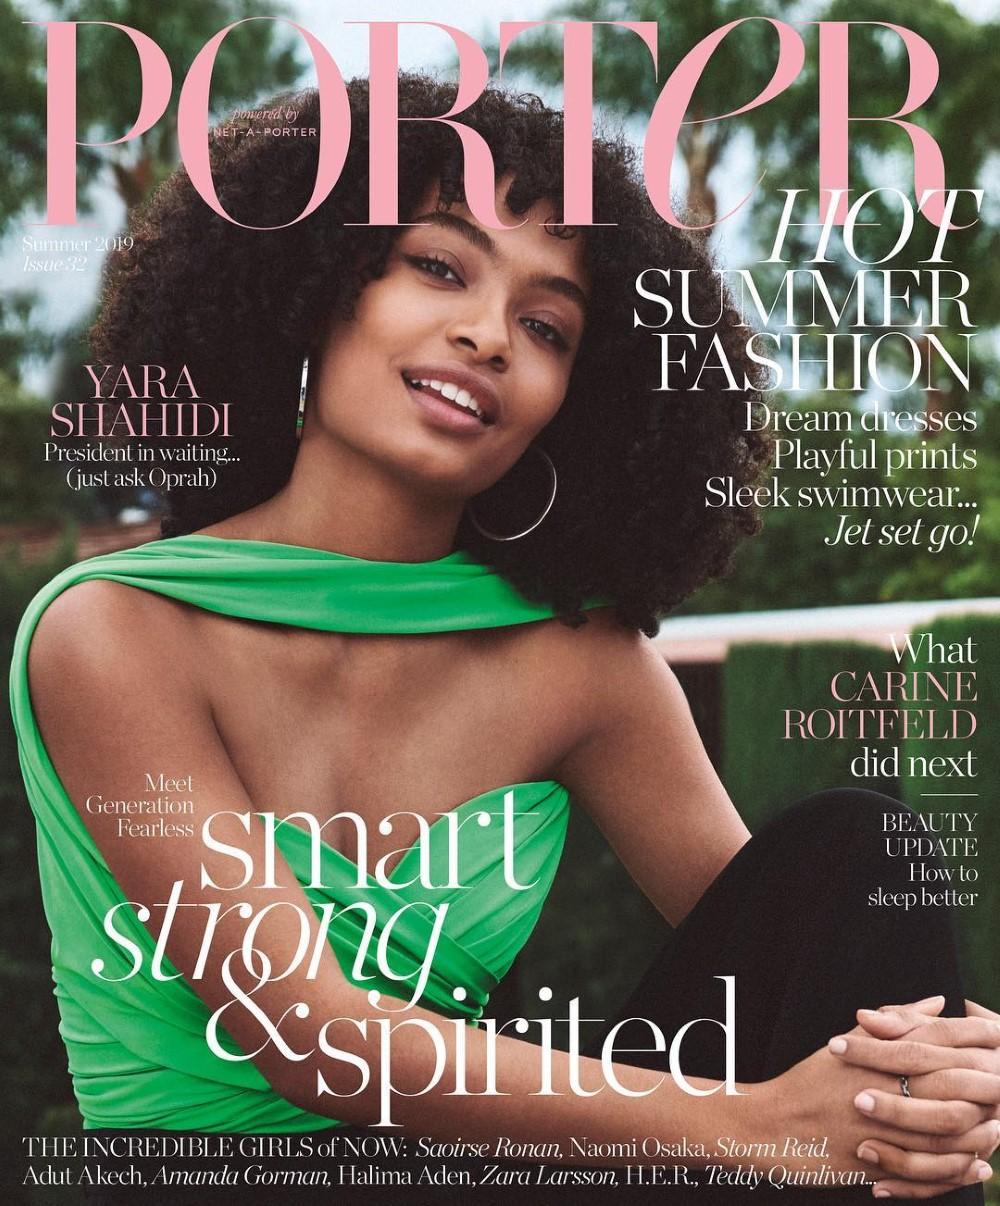 Yara-Shahidi-Cass-Bird-Porter-Magazine-Summer-2019-+(1).jpg